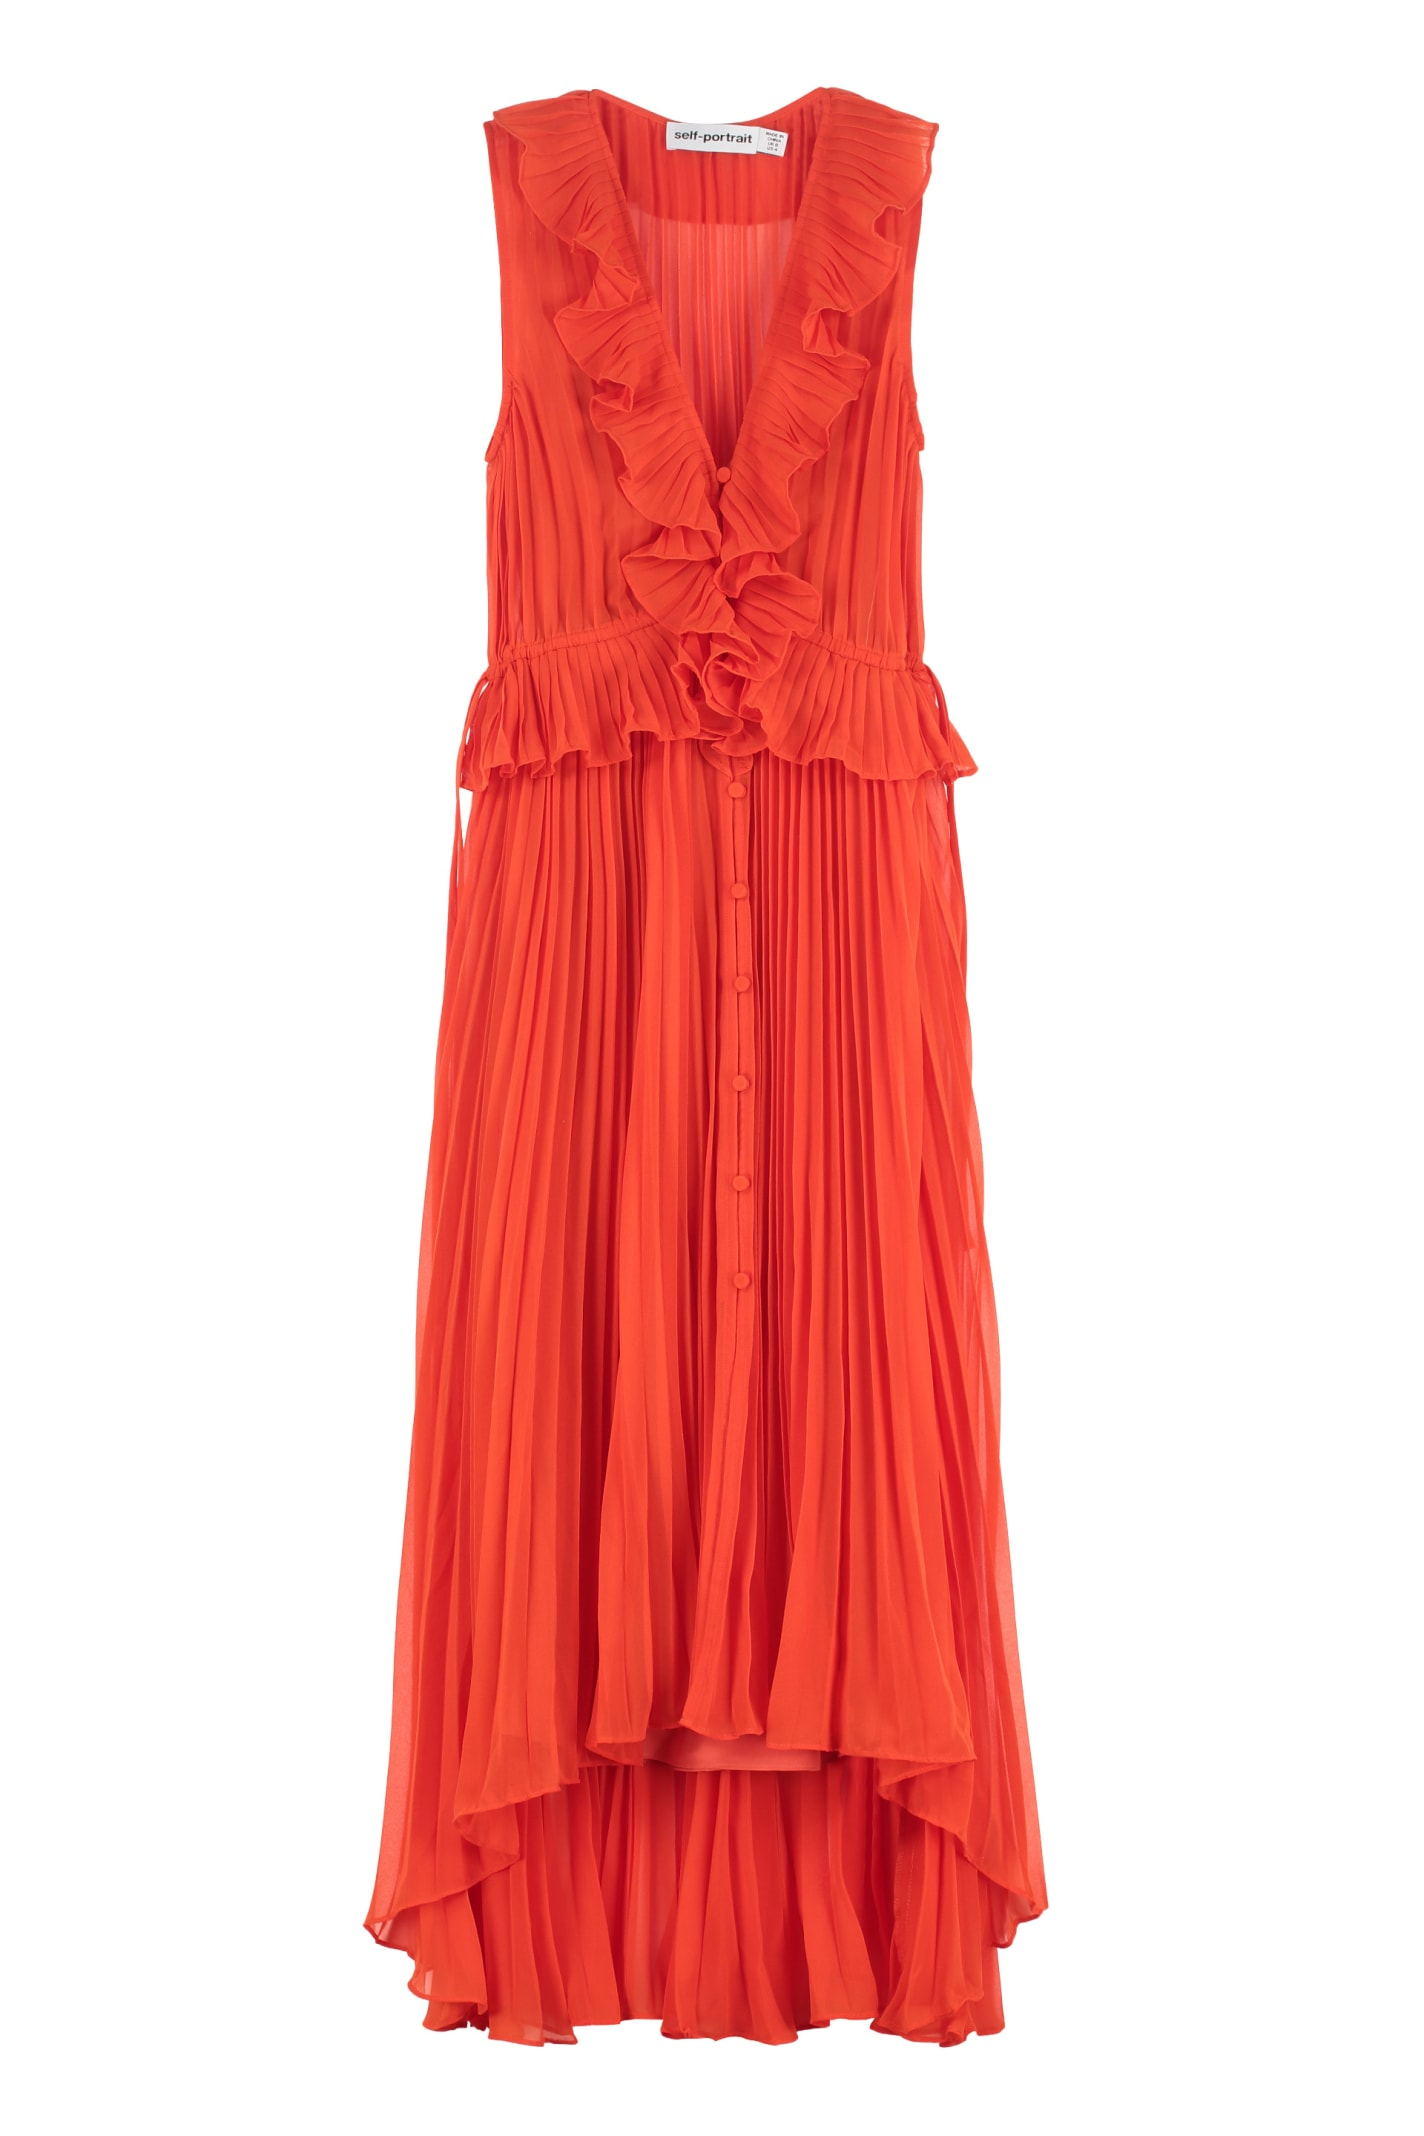 Buy self-portrait Pleated Midi Dress online, shop self-portrait with free shipping